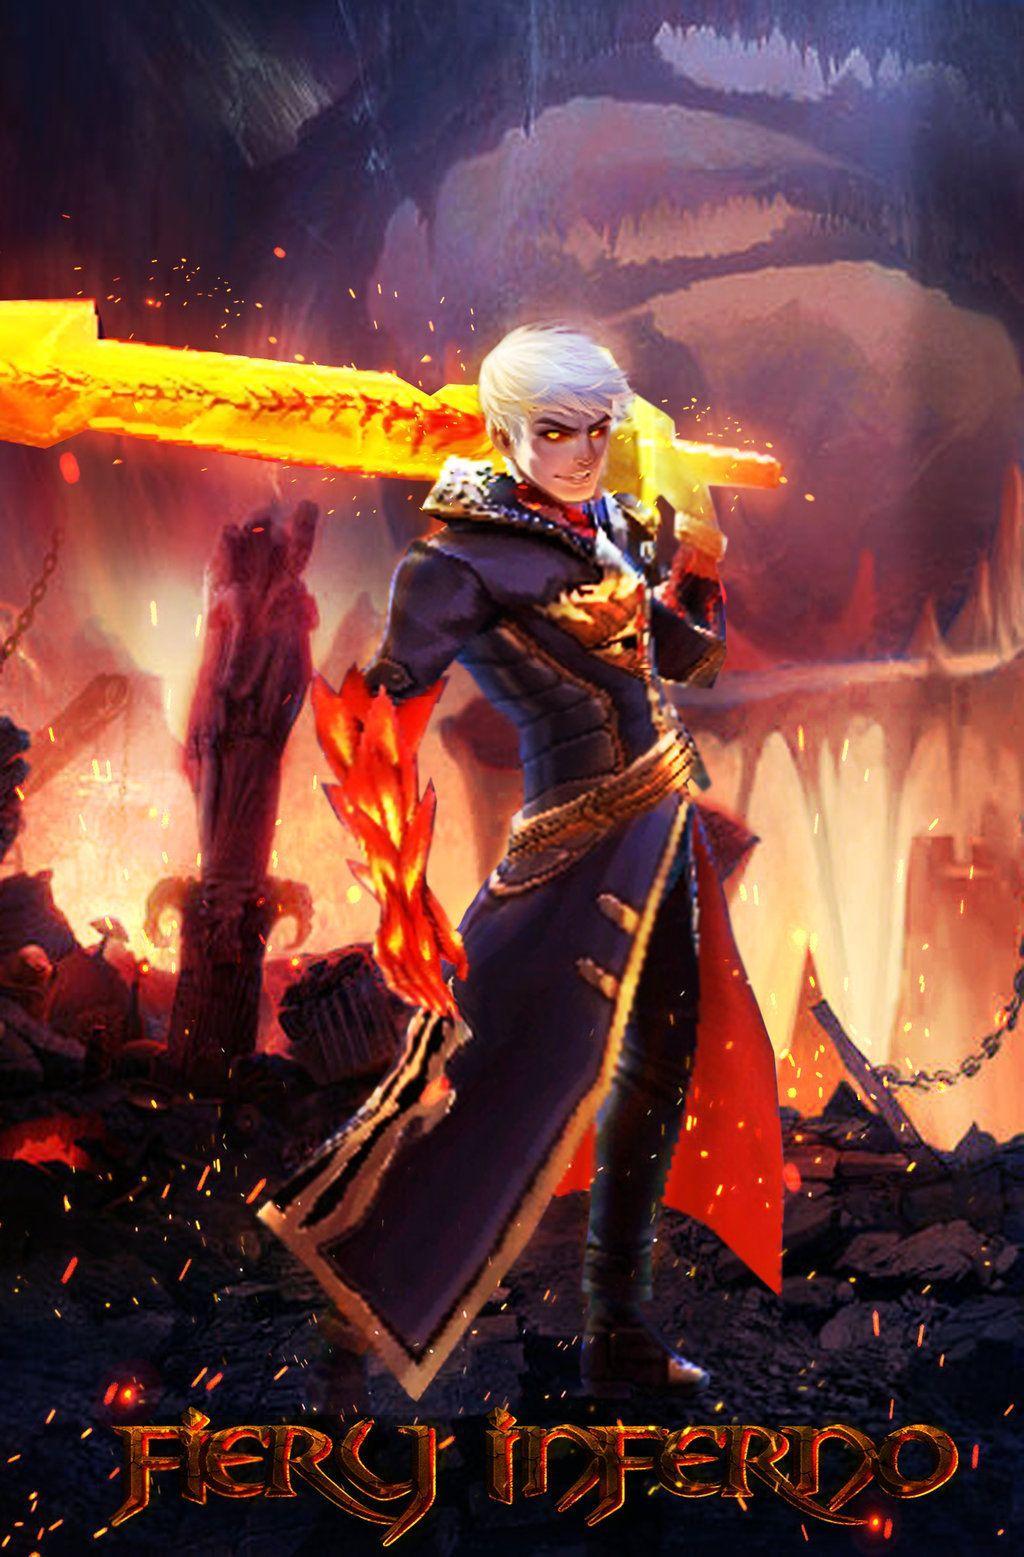 Alucard Mobile Legends Wallpapers Top Free Alucard Mobile Legends Backgrounds Wallpaperaccess